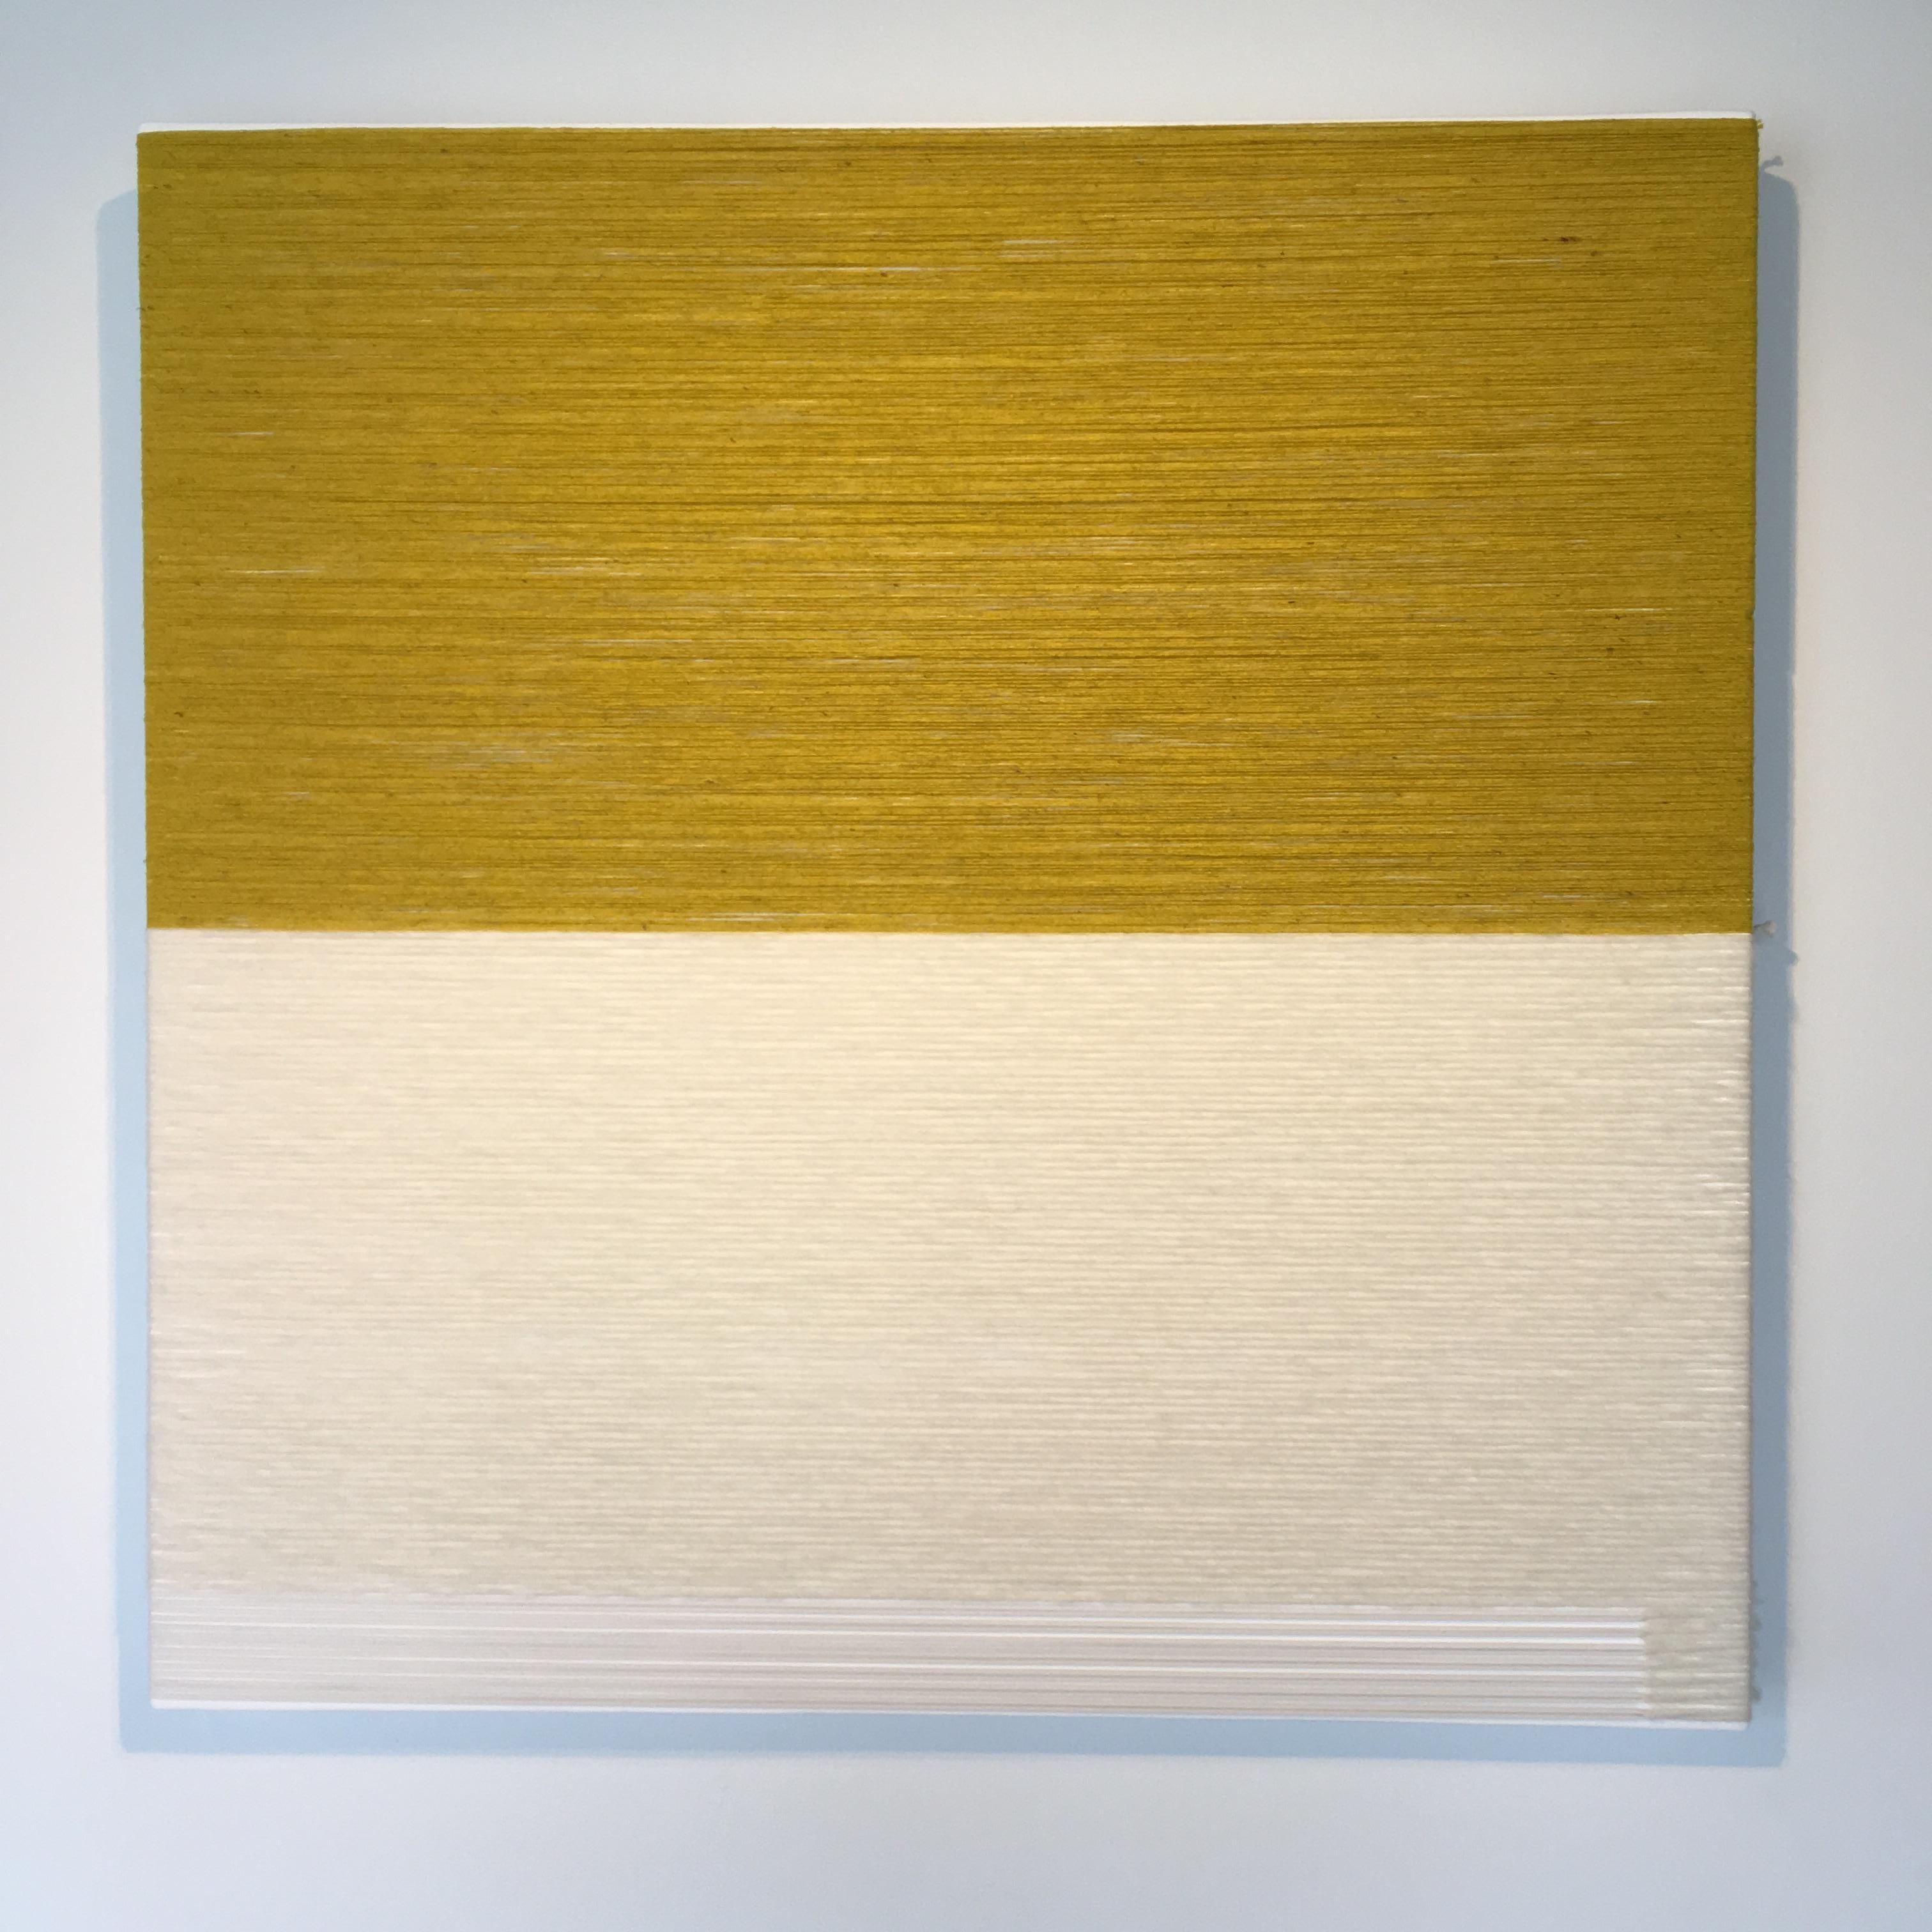 Promised Land, Contemporary Textile Art, Contemporary Art, 21st Century